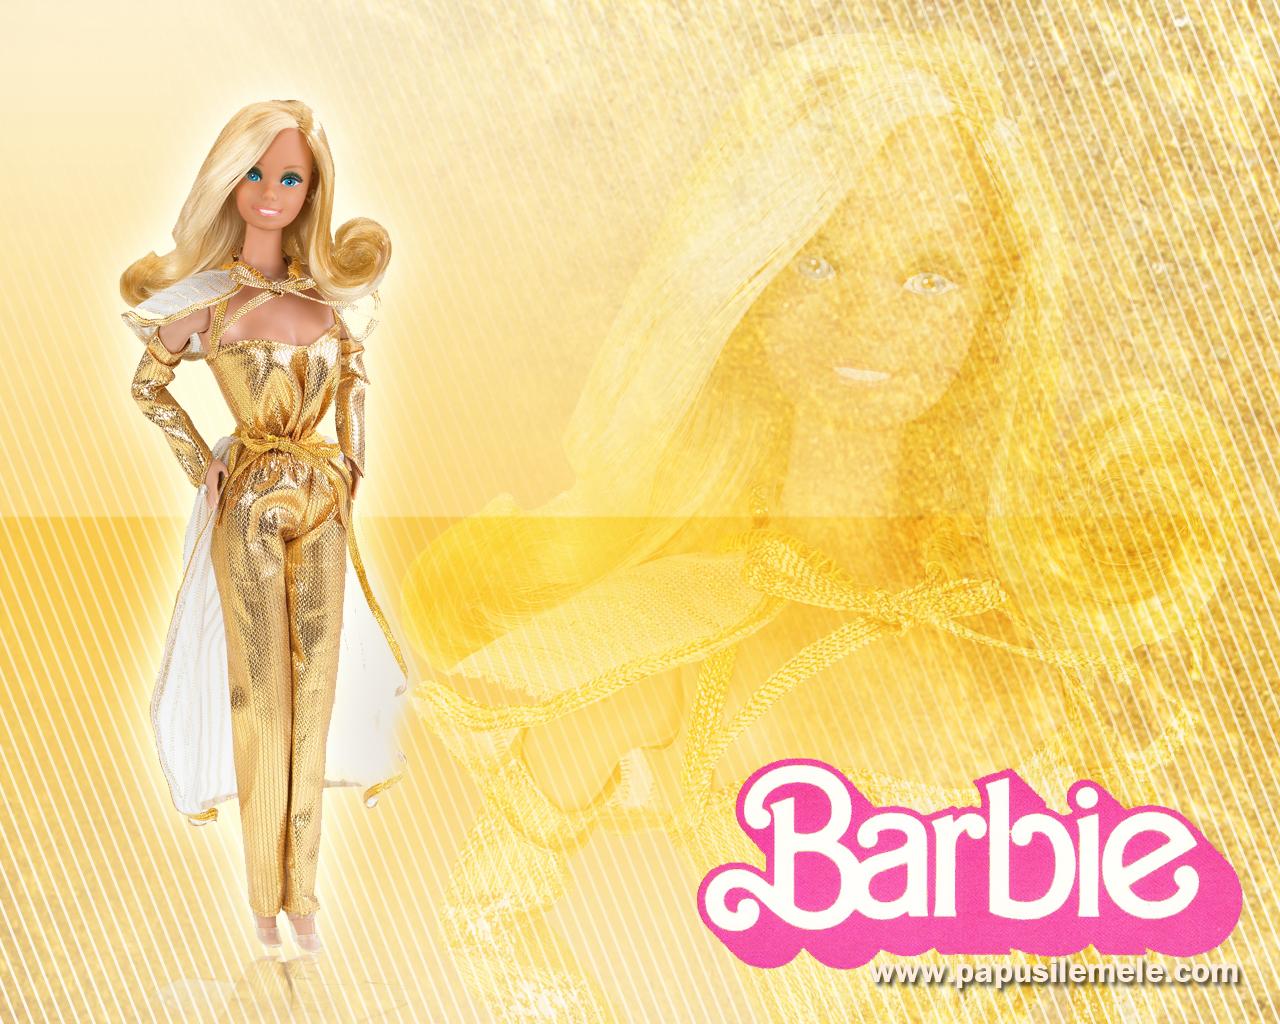 Barbie Wallpaper Hd: Barbie Screensavers Wallpapers